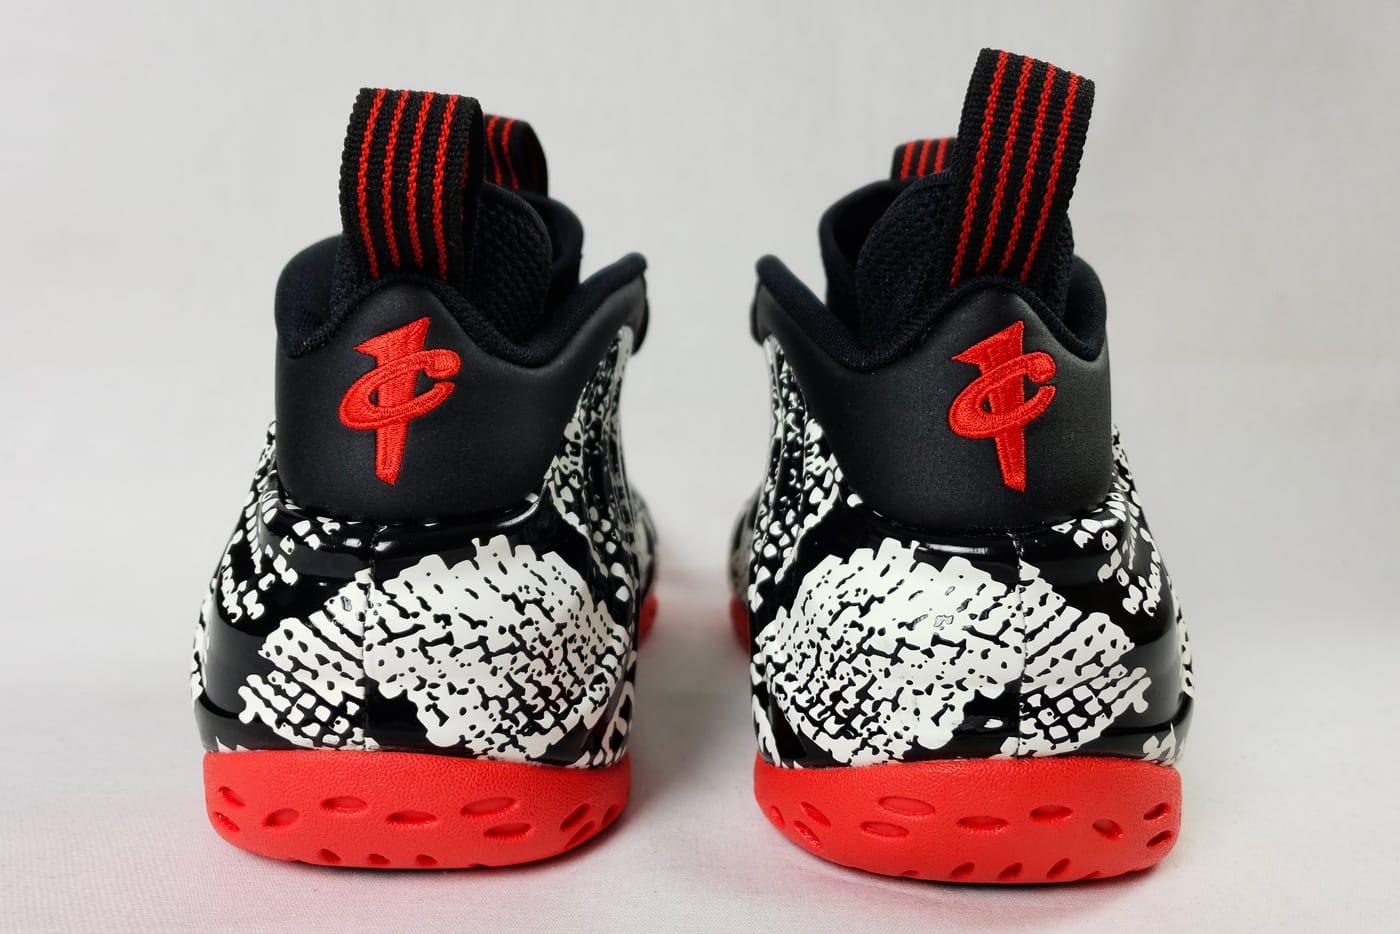 Nike Foamposite One Triple Black Suede Shoe On Foot With ...